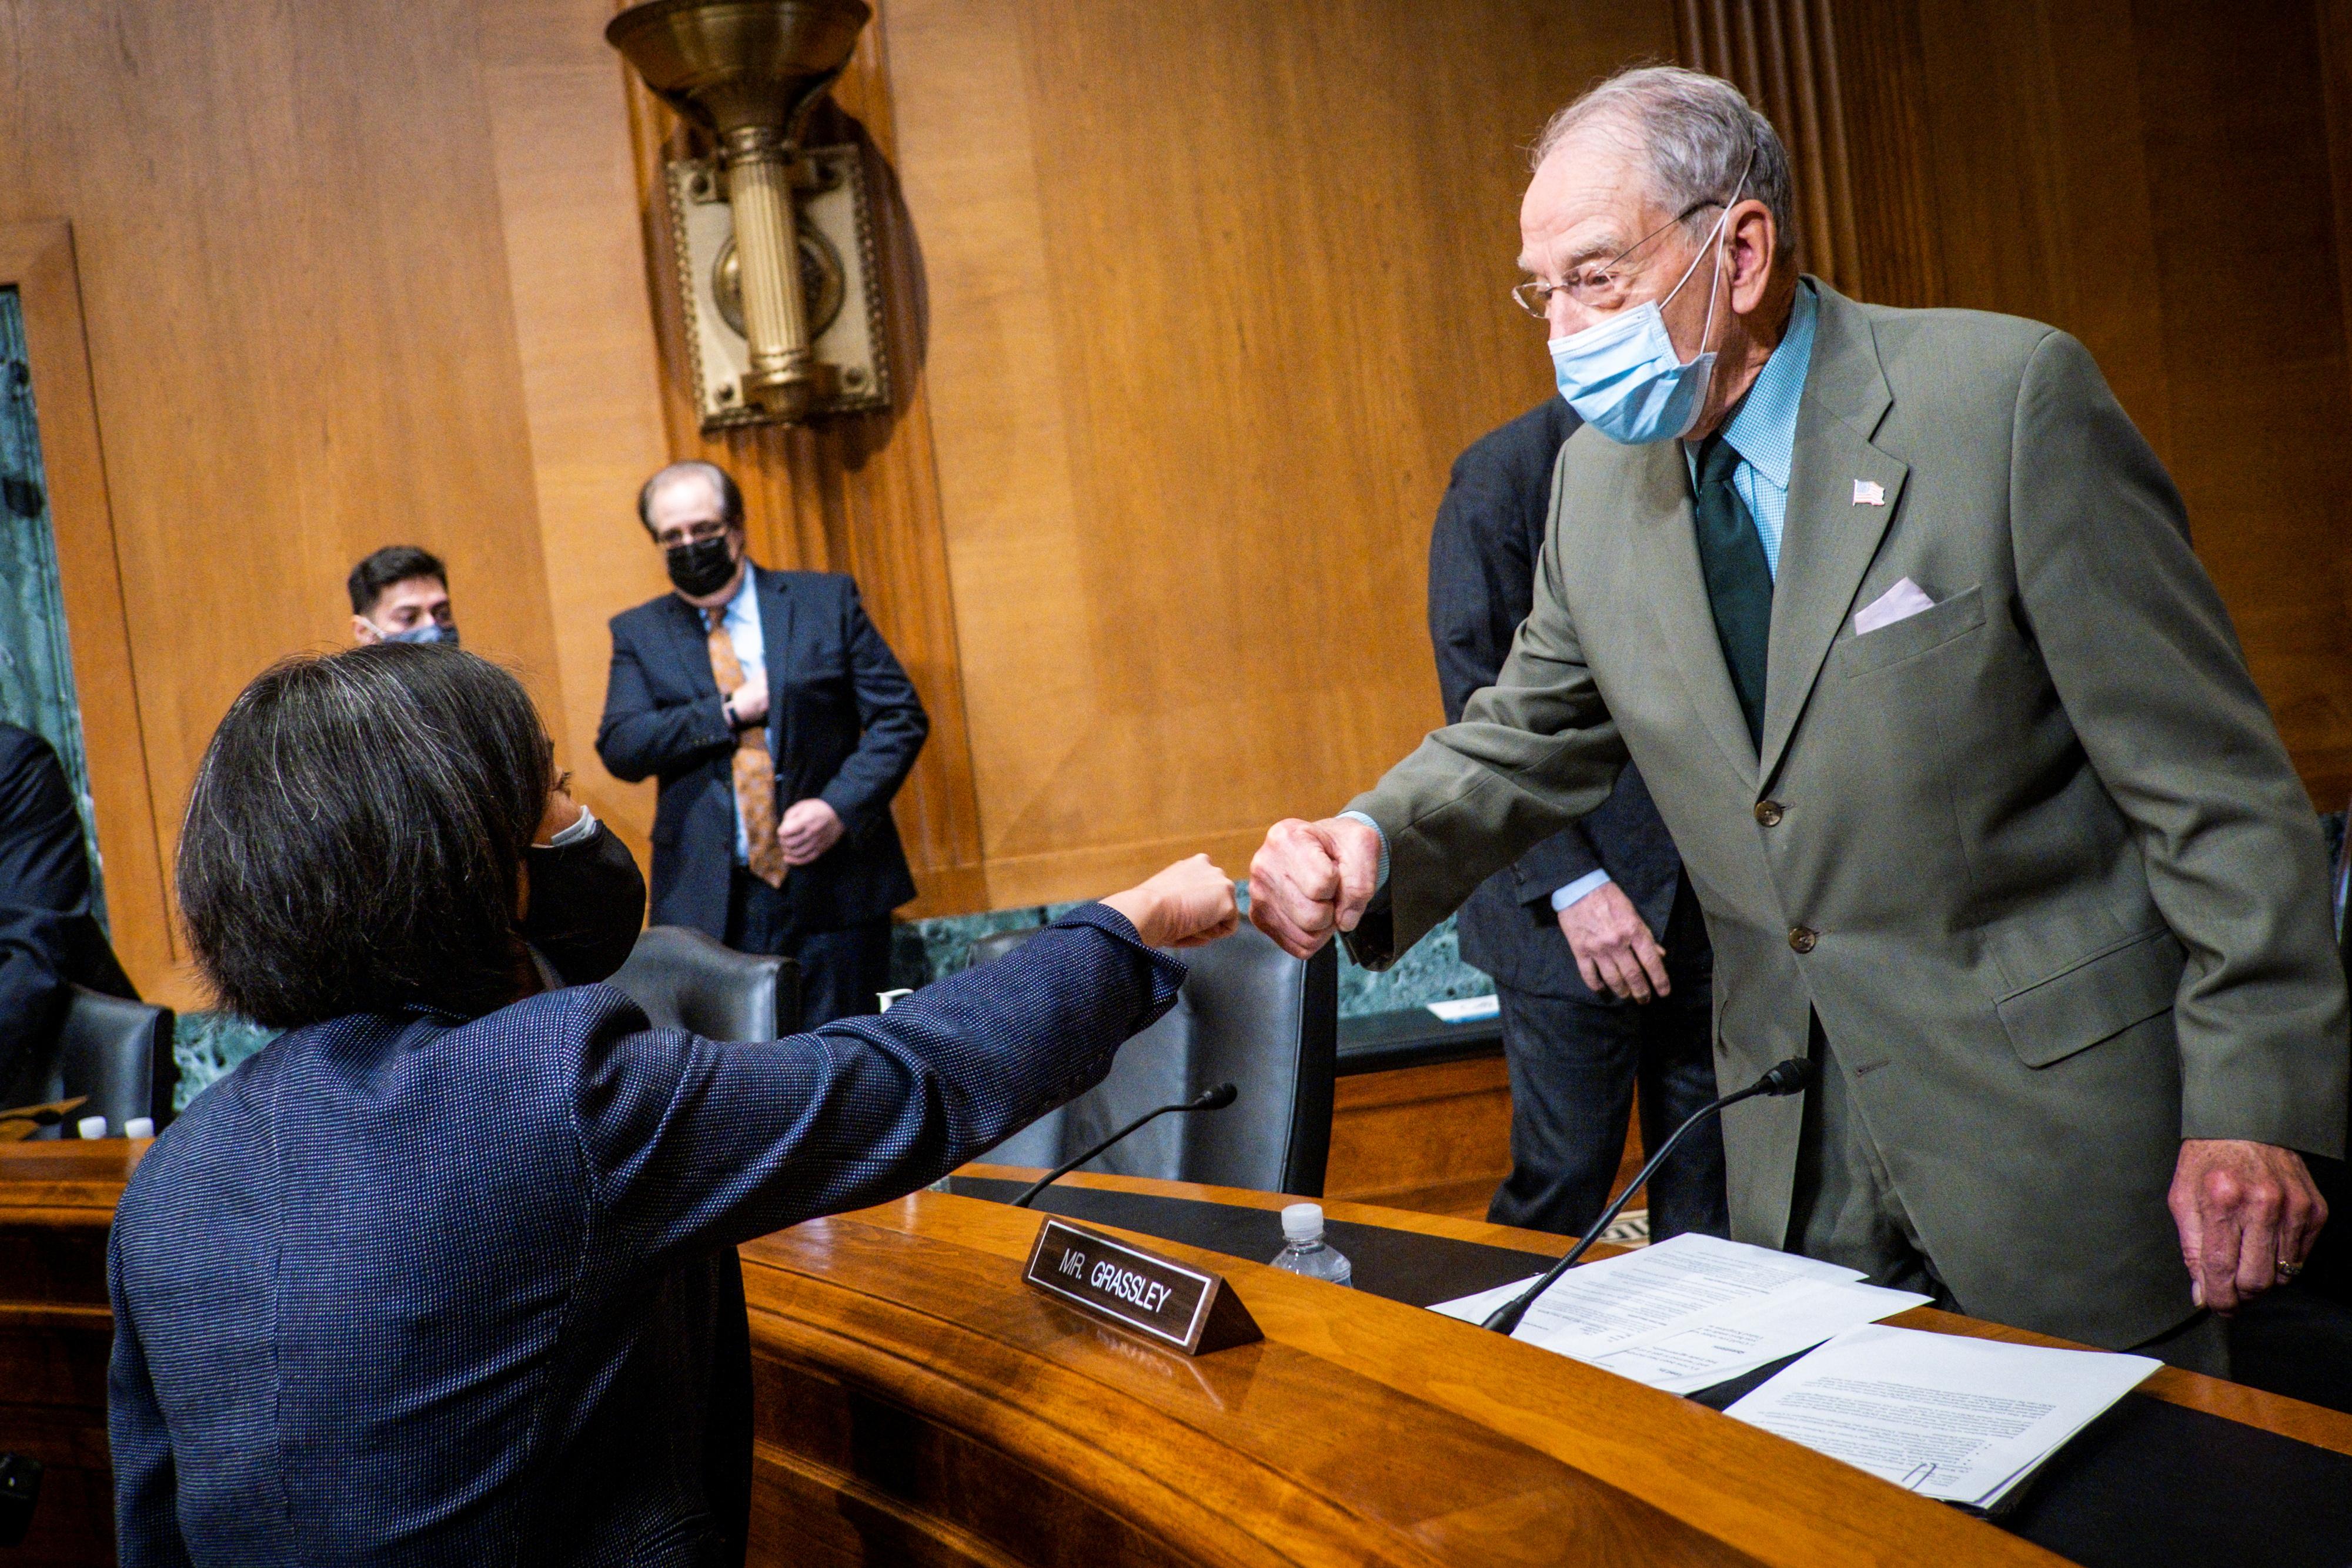 U.S. Trade Representative Katherine Tai fist bumps with Sen. Chuck Grassley (R-IA) before she testifies before the Senate Finance Committee on Capitol Hill in Washington, U.S., May 12, 2021.  Pete Marovich/Pool via REUTERS